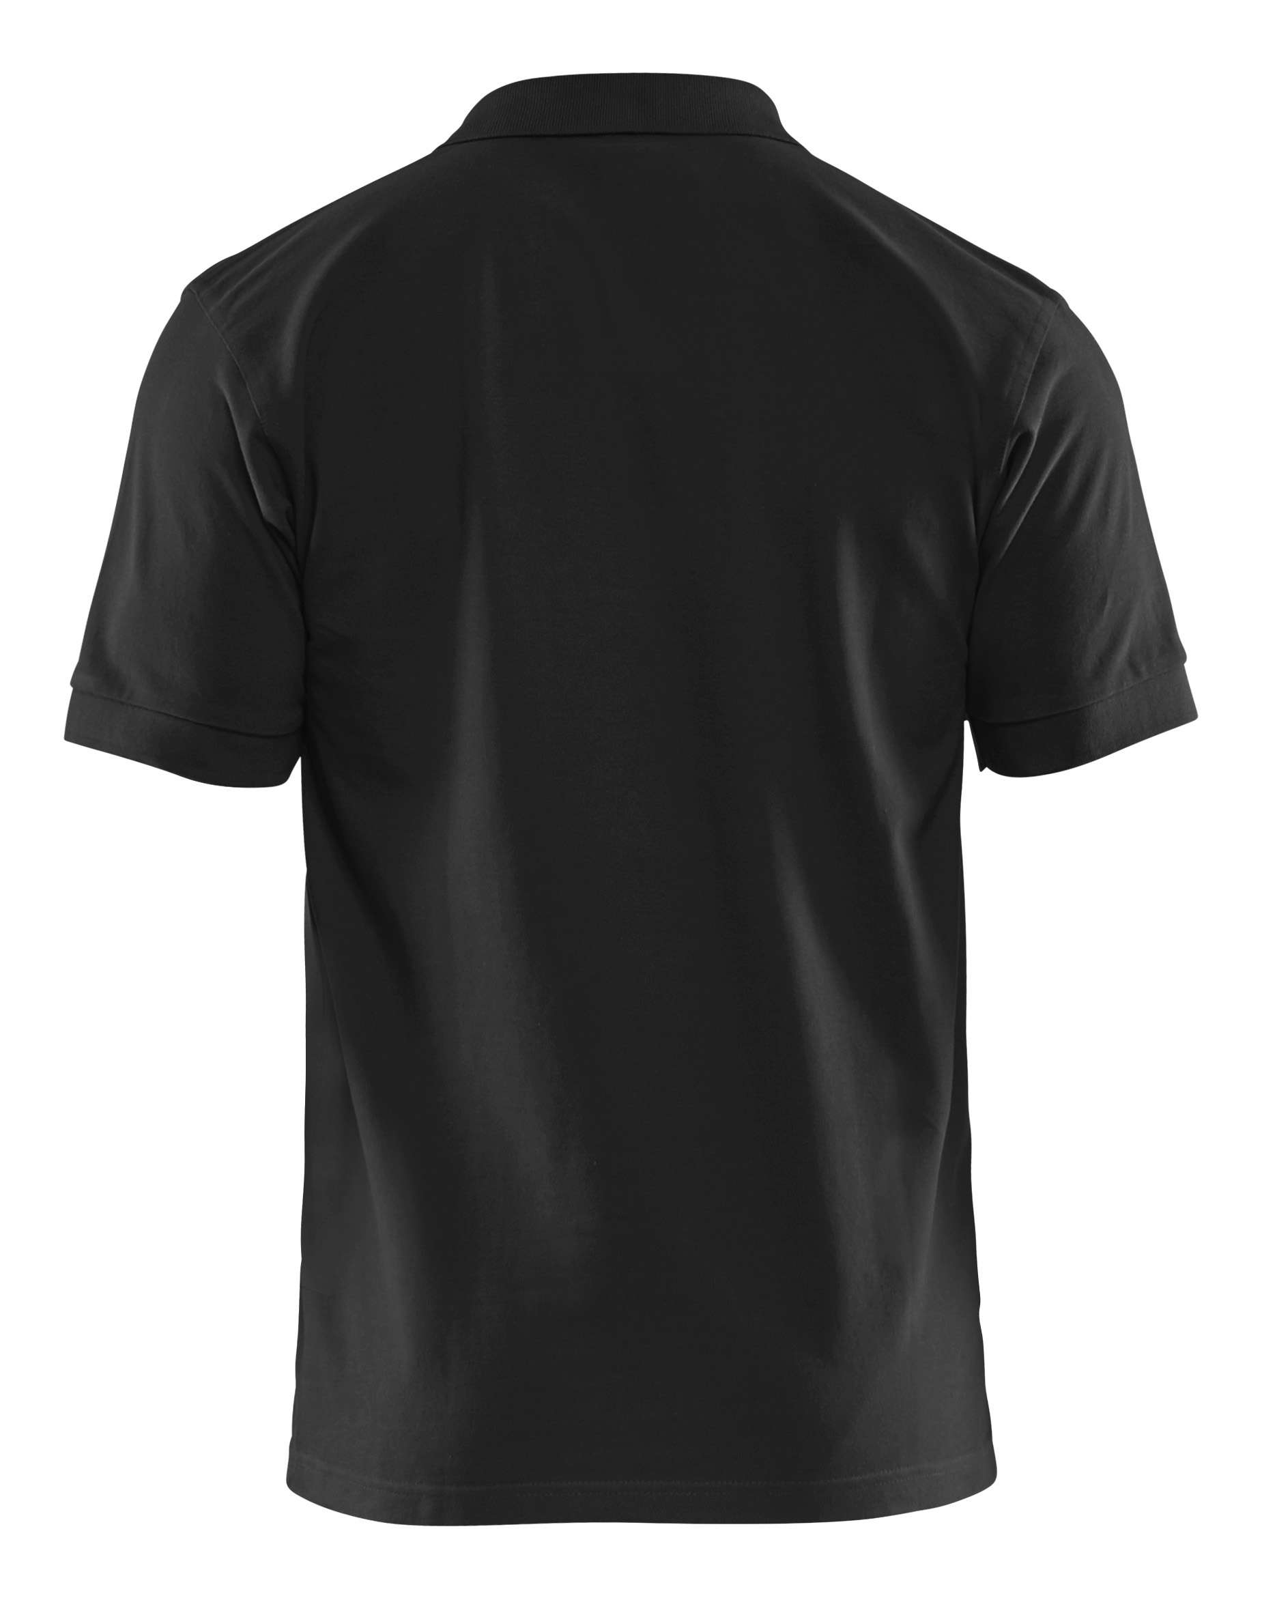 Blaklader Polo shirts 33051035 zwart(9900)